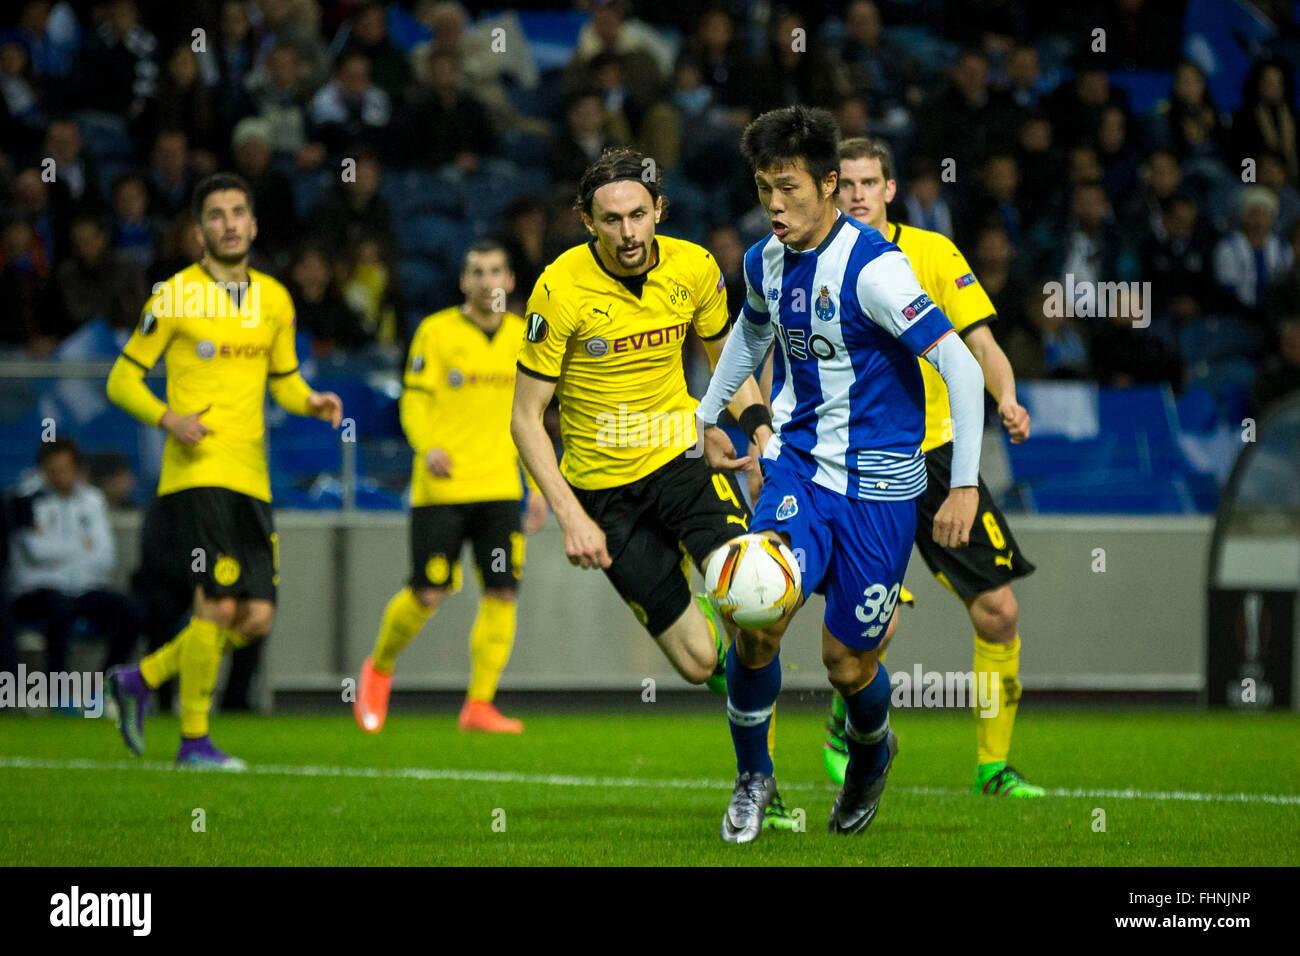 Porto, Portugal. 25th February, 2016. FC Porto's player Suk during UEFA Europa League  2015/16 round 32 second - Stock Image